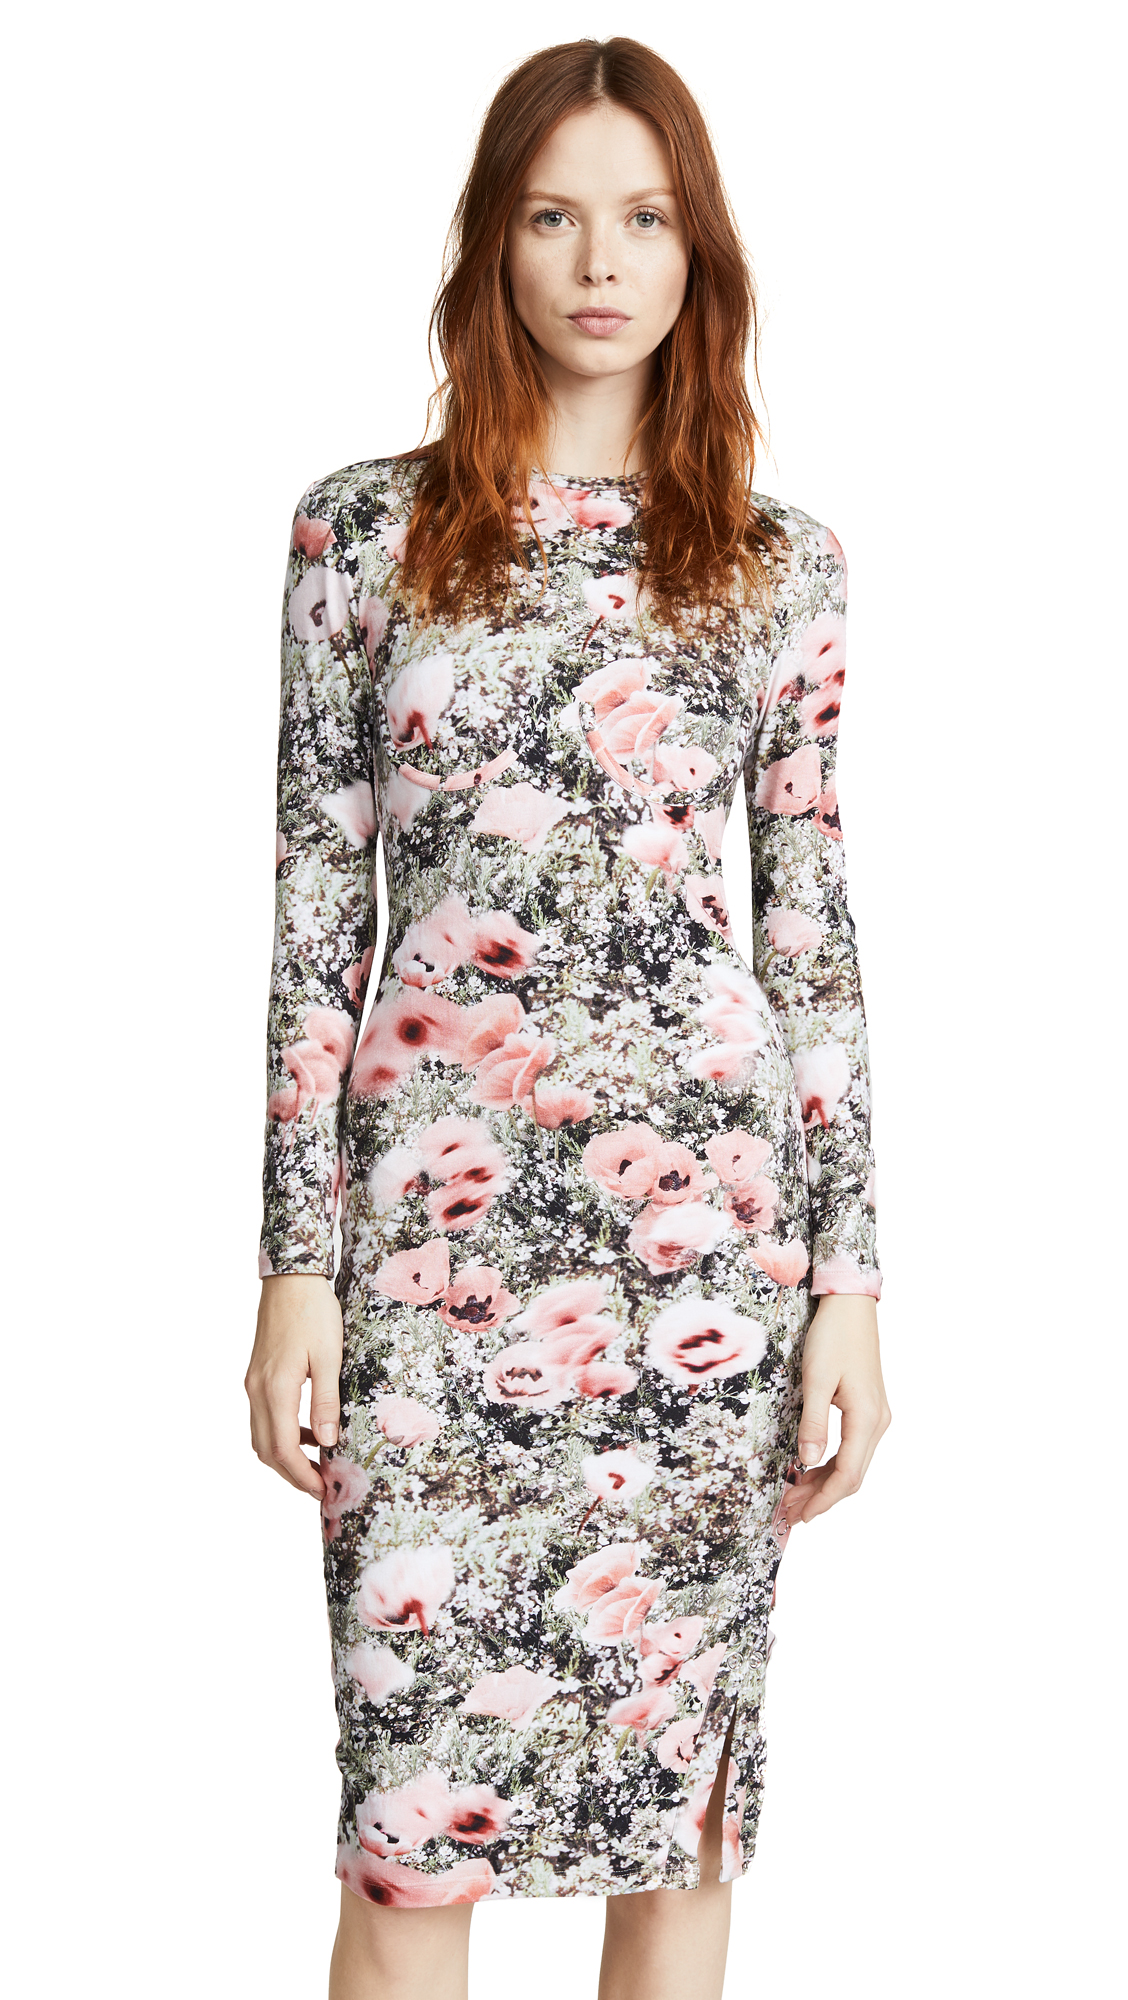 Feur Du Ma Bust Detai Knit Dress Red, Poppy Print